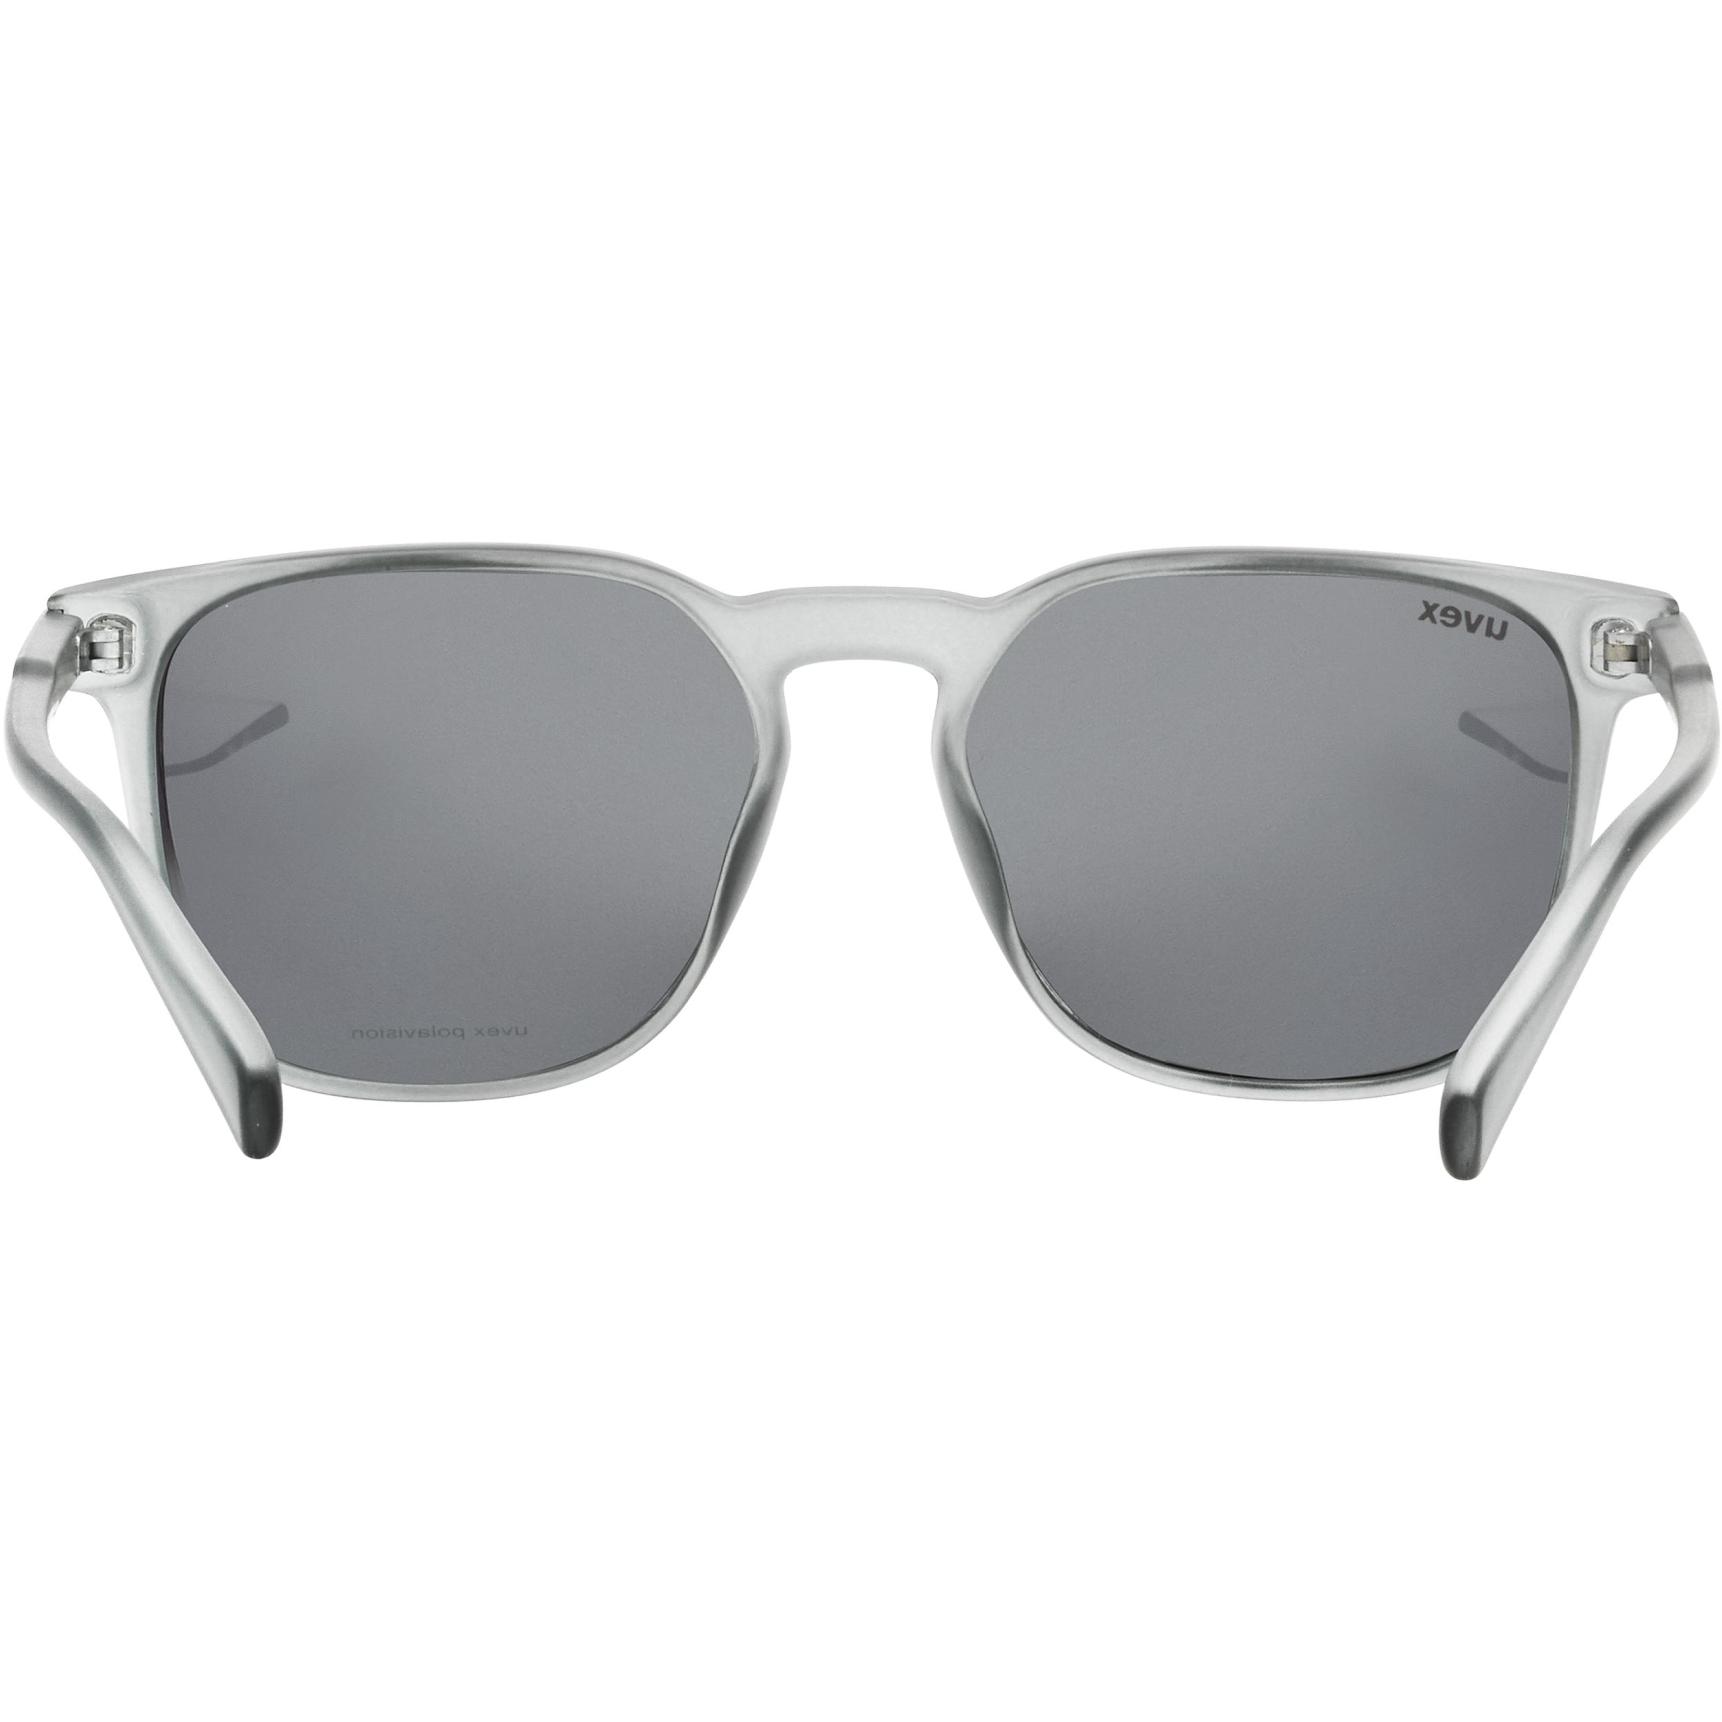 Image of Uvex lgl 49 P Glasses - smoke mat/polavision mirror silver